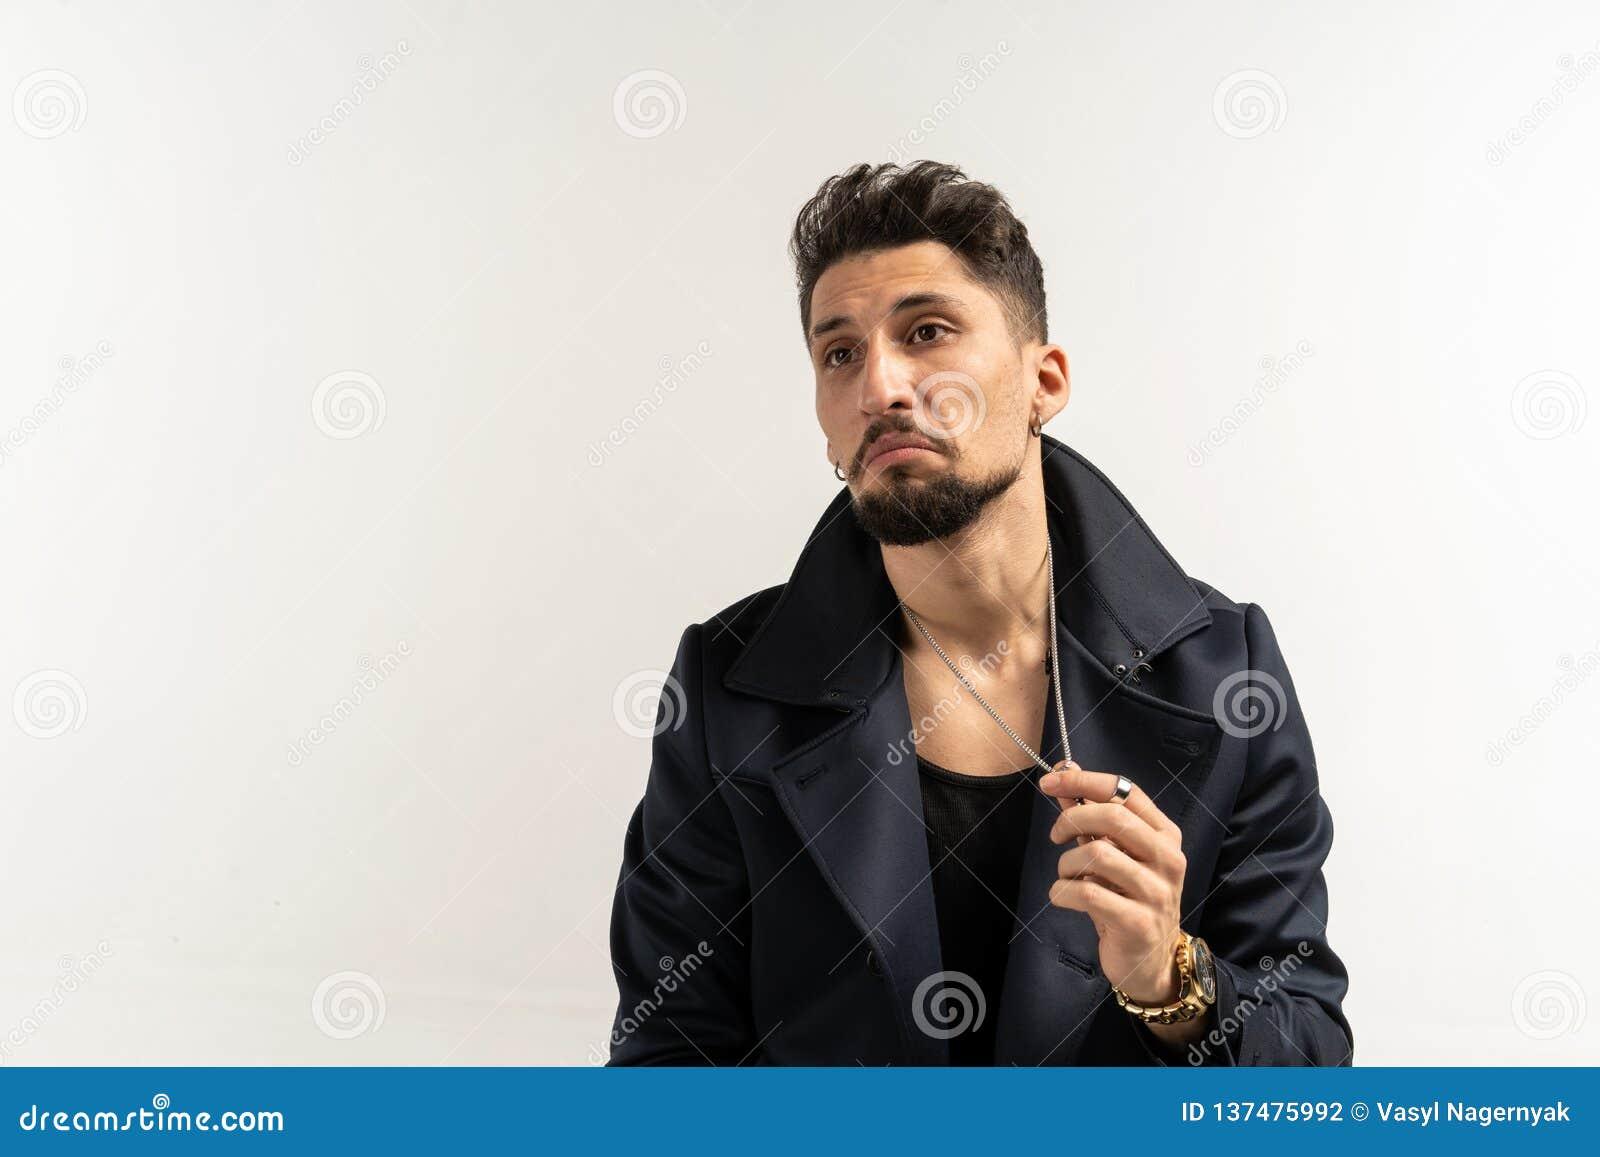 Elegant man with beard in black jacket posing on white wall